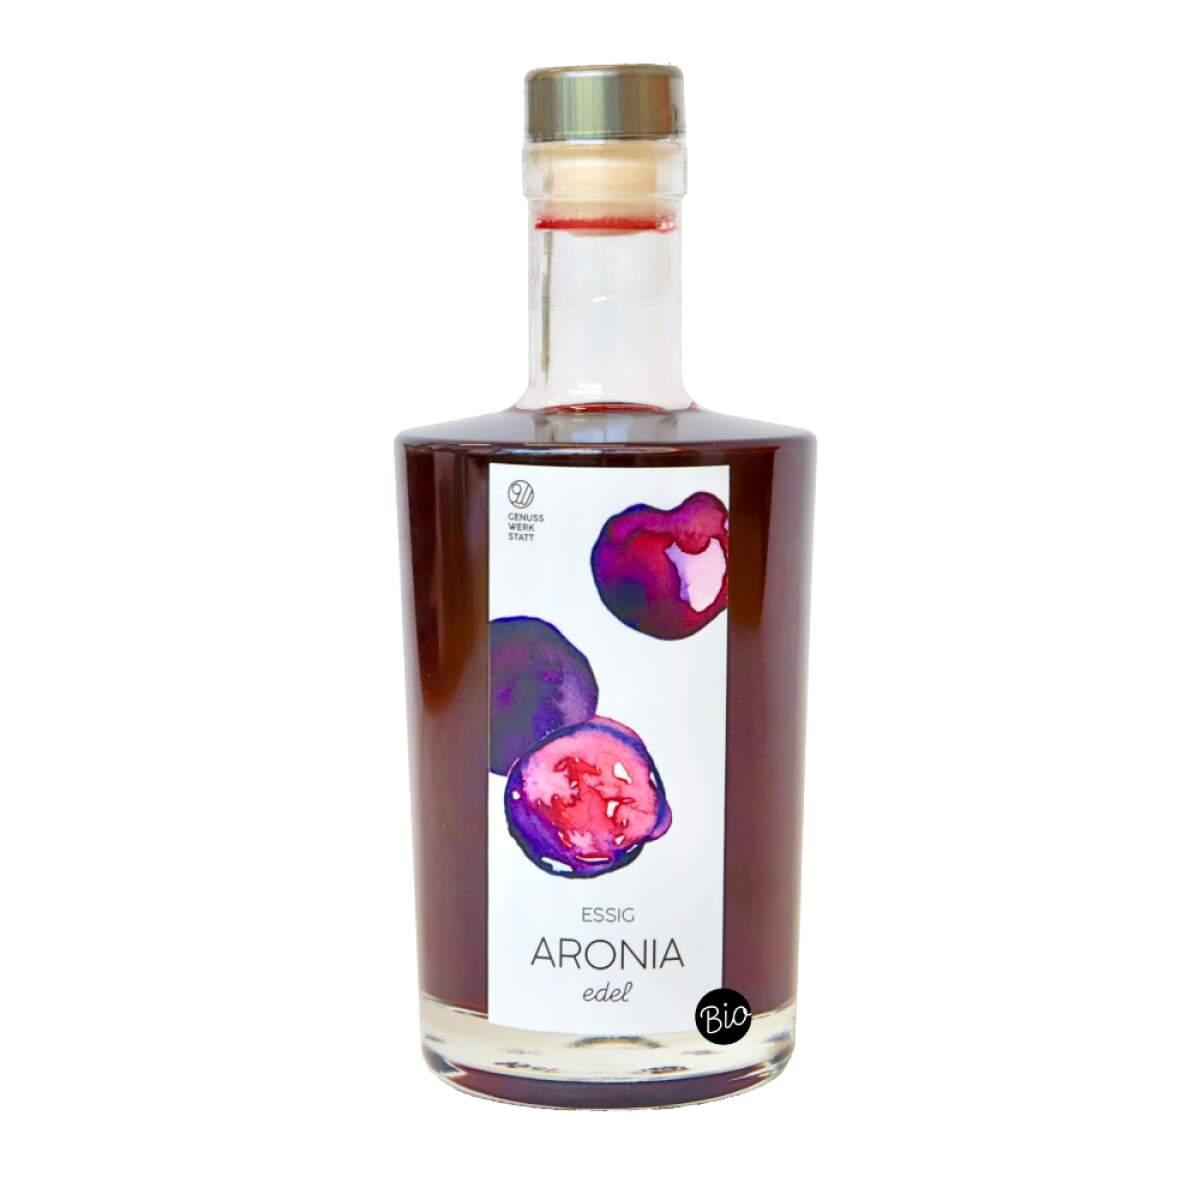 Flasche-Essig-Aronia_Bio_0990_1000pxIosDMGKLfXKc8